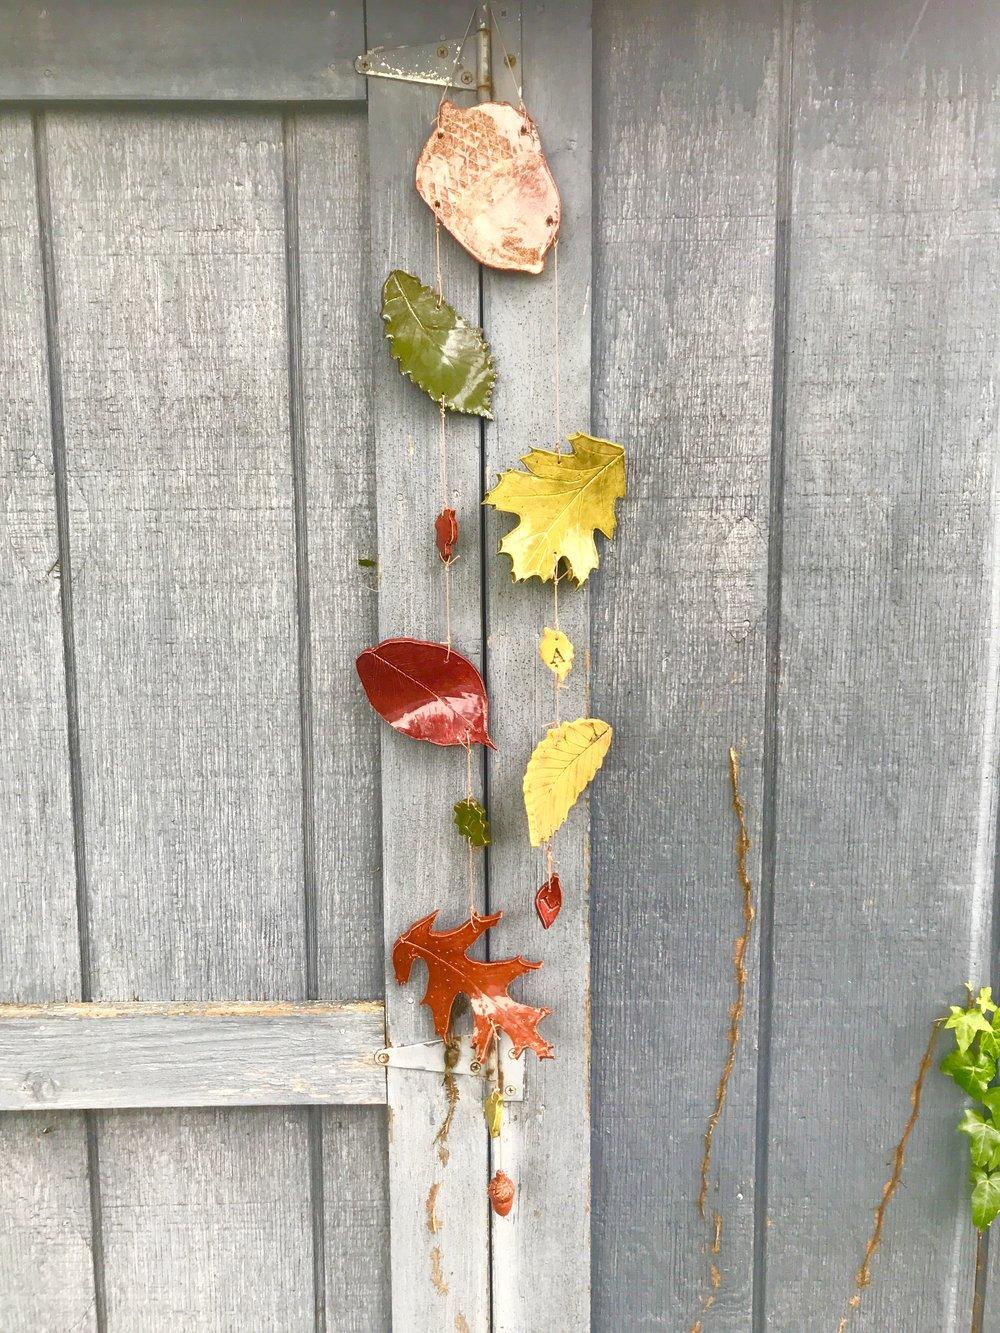 Festive Autumn Ceramic Home-Decor Workshop - Seasonal Habitat Series: AutumnNovember 4th & 11thMommy & Me @ 3-4:30pmAdult@ 5-6:30pm